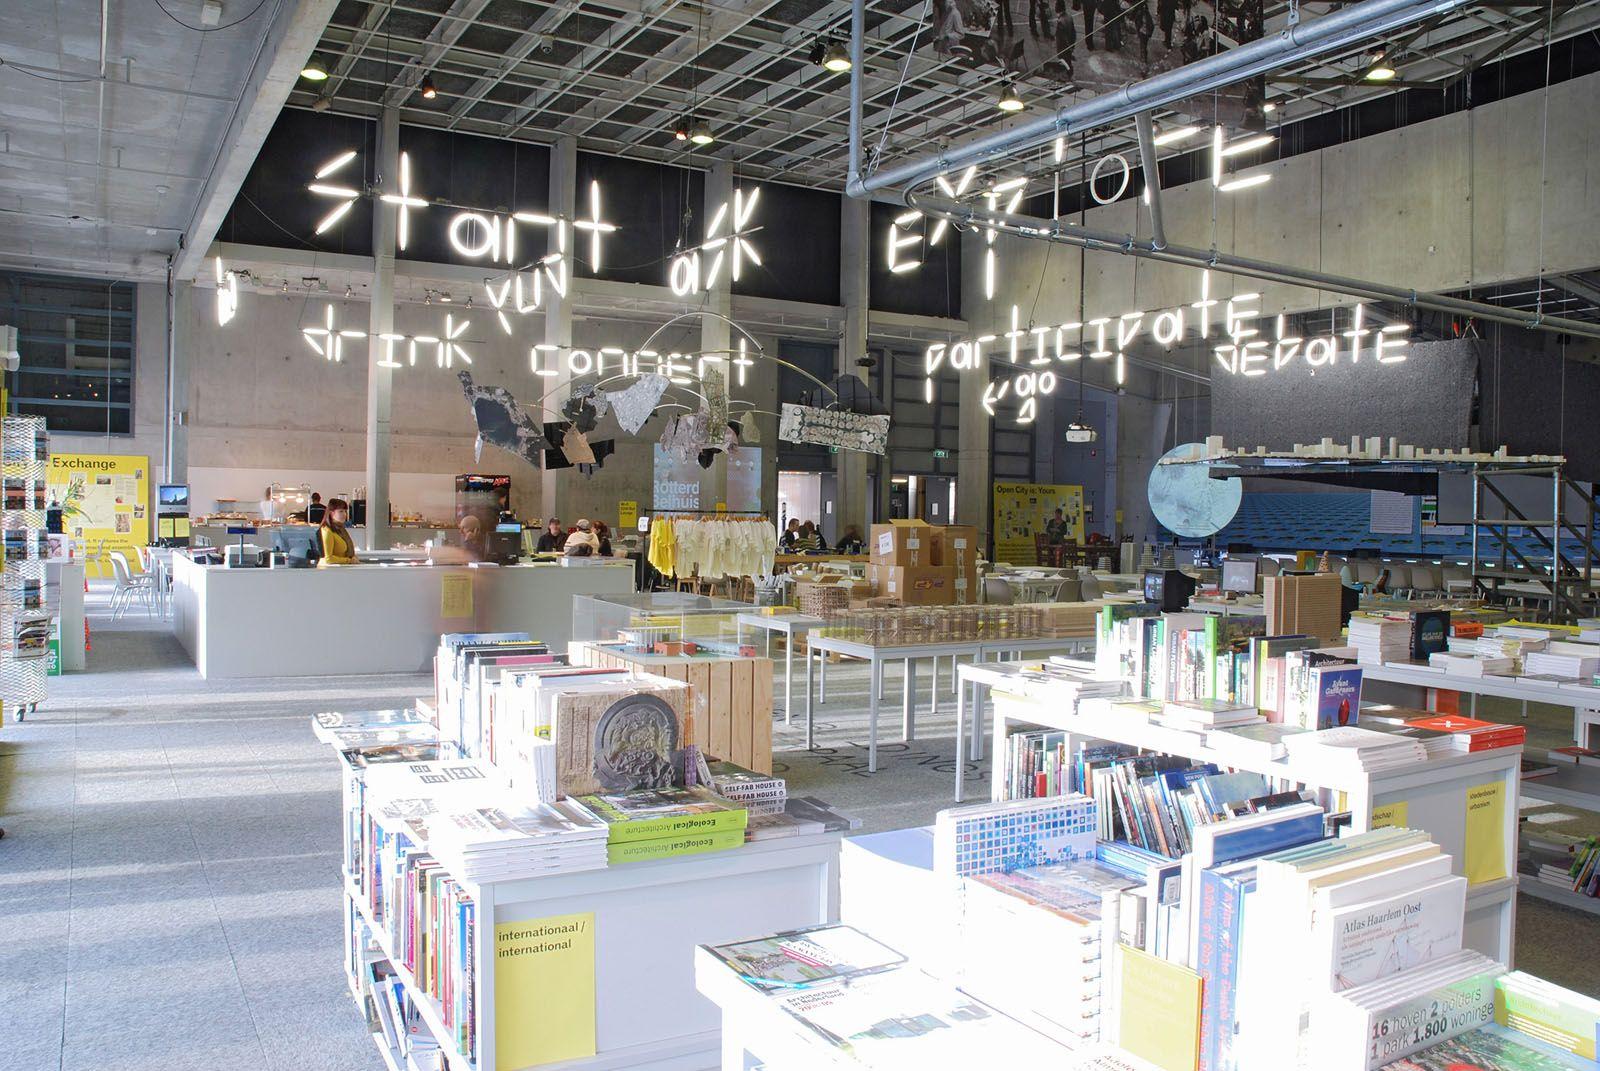 International Architecture Biennale Rotterdam 2009_a